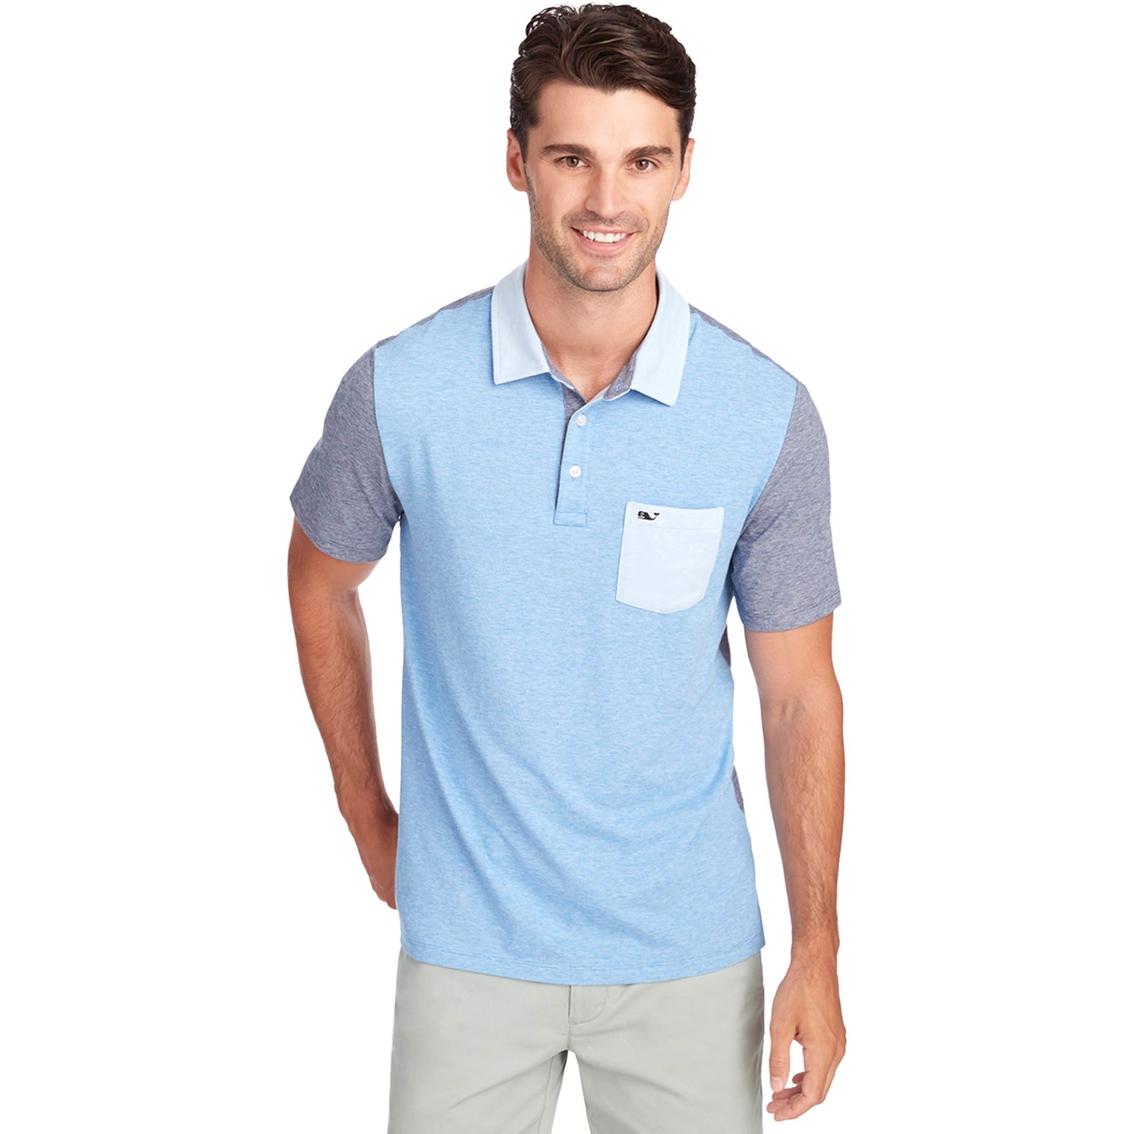 076f608de Vineyard Vines Victory Edgartown Polo Shirt